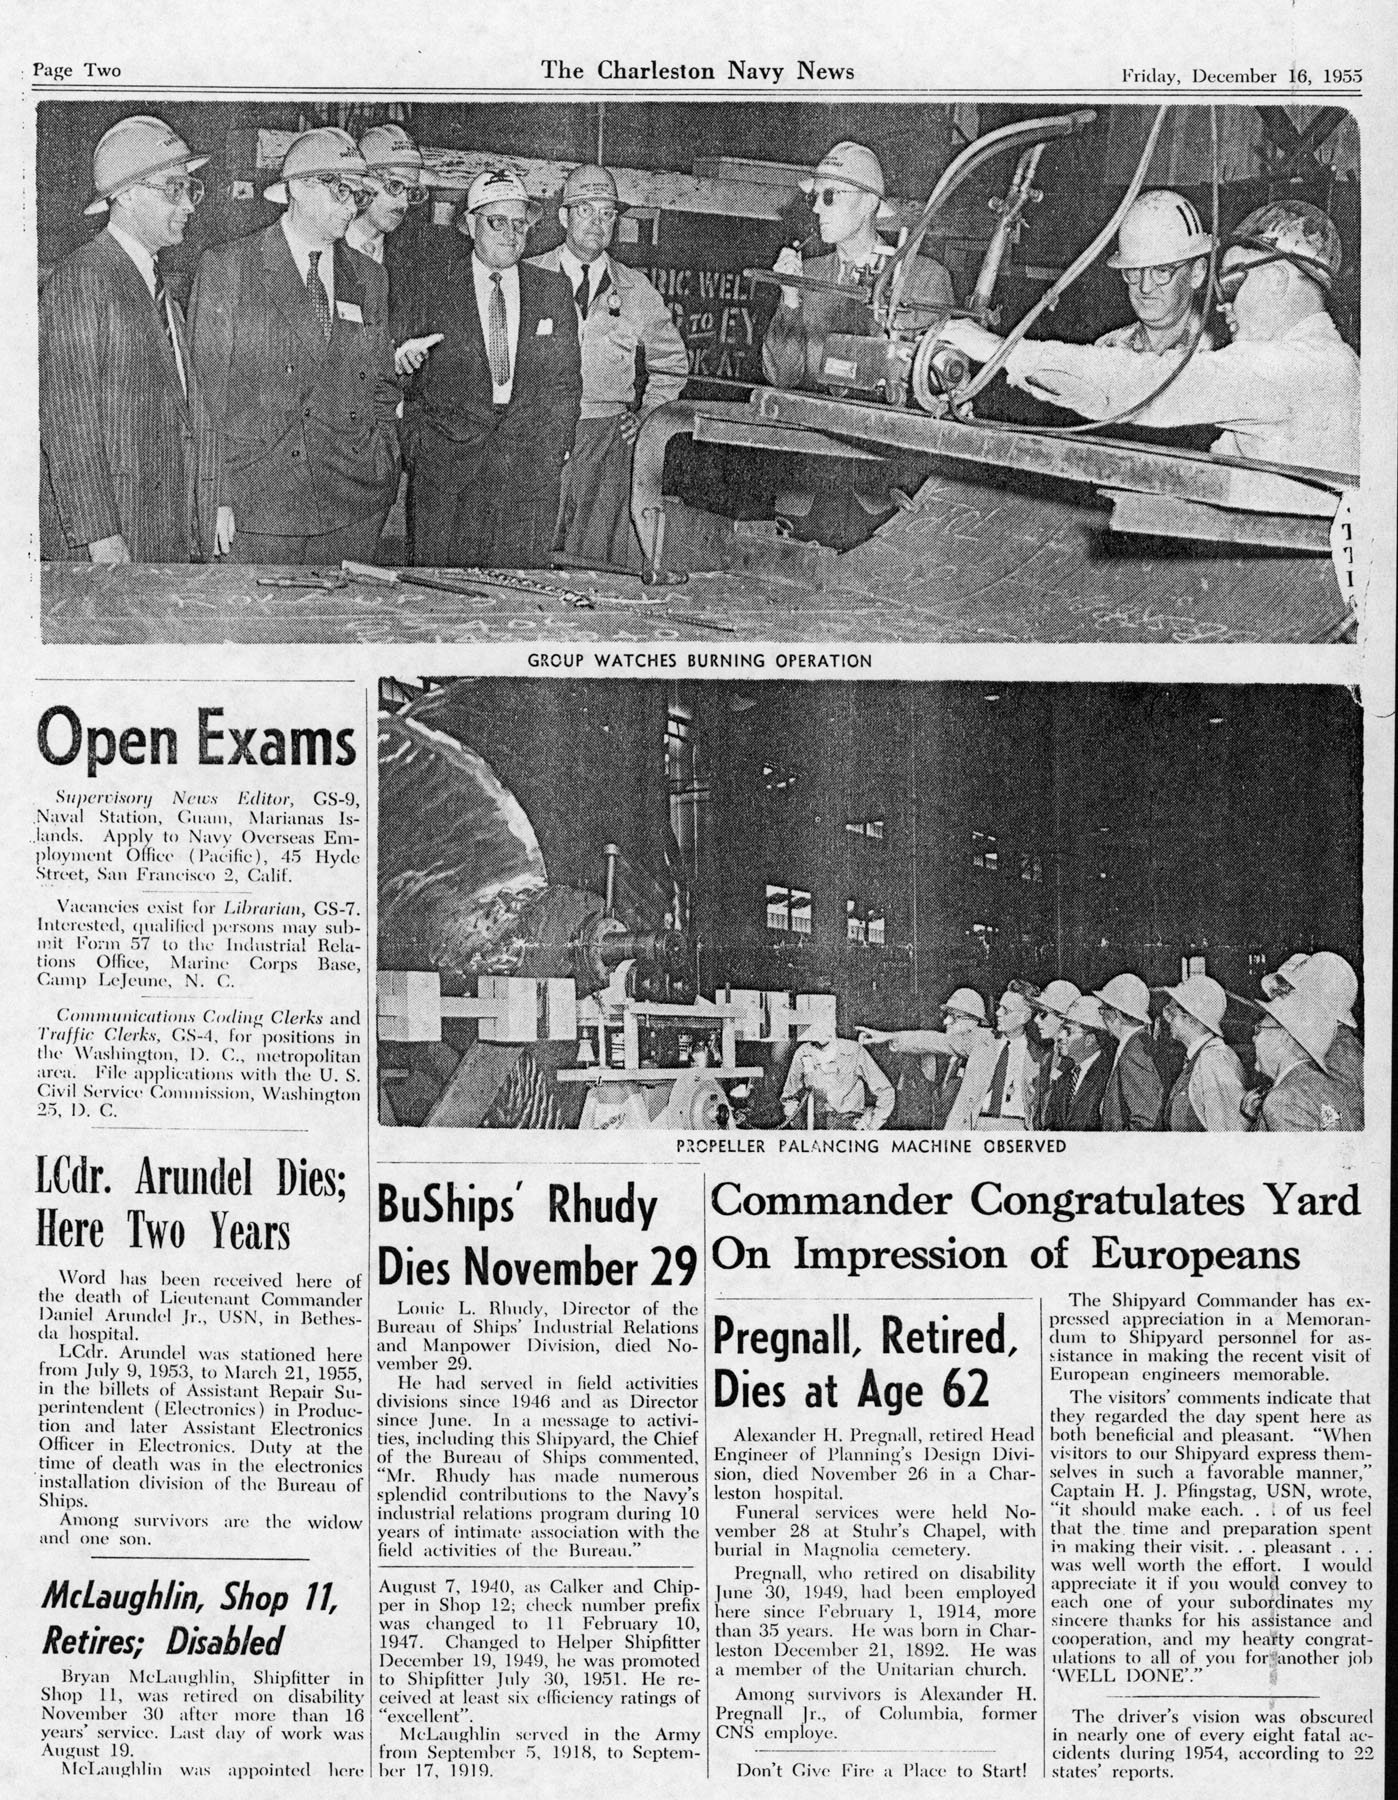 The Charleston Navy News, Volume 14, Edition 11, page ii